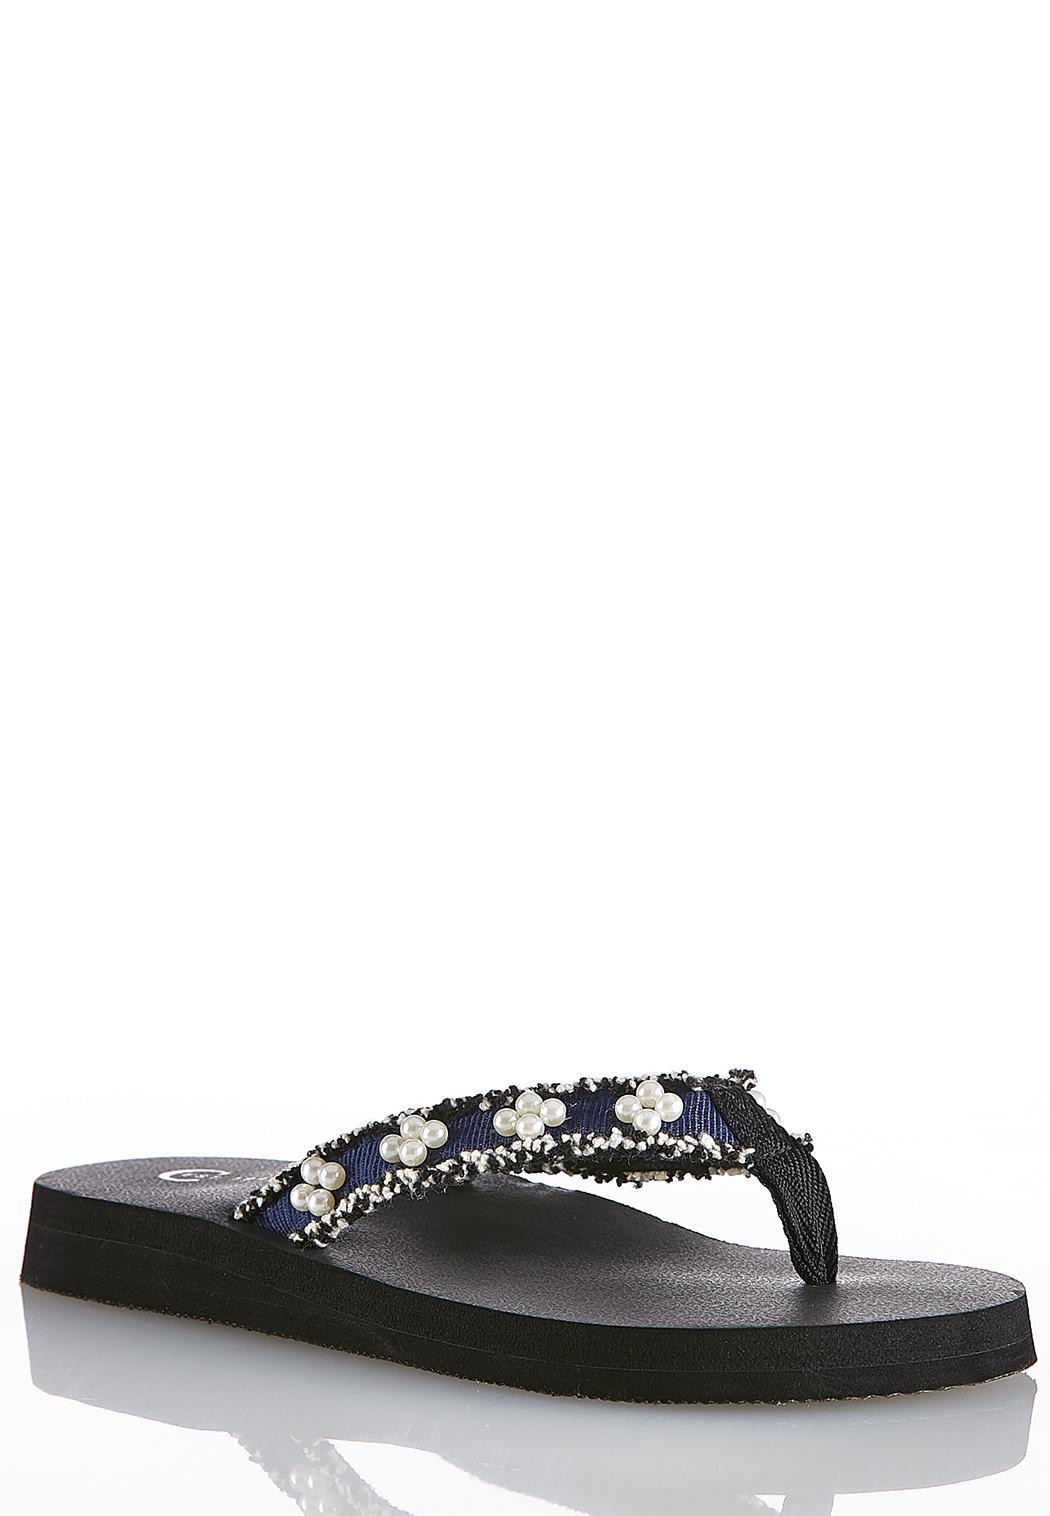 12dbeeea3b2c Frayed Denim Embellished Flip Flops Sandals Cato Fashions